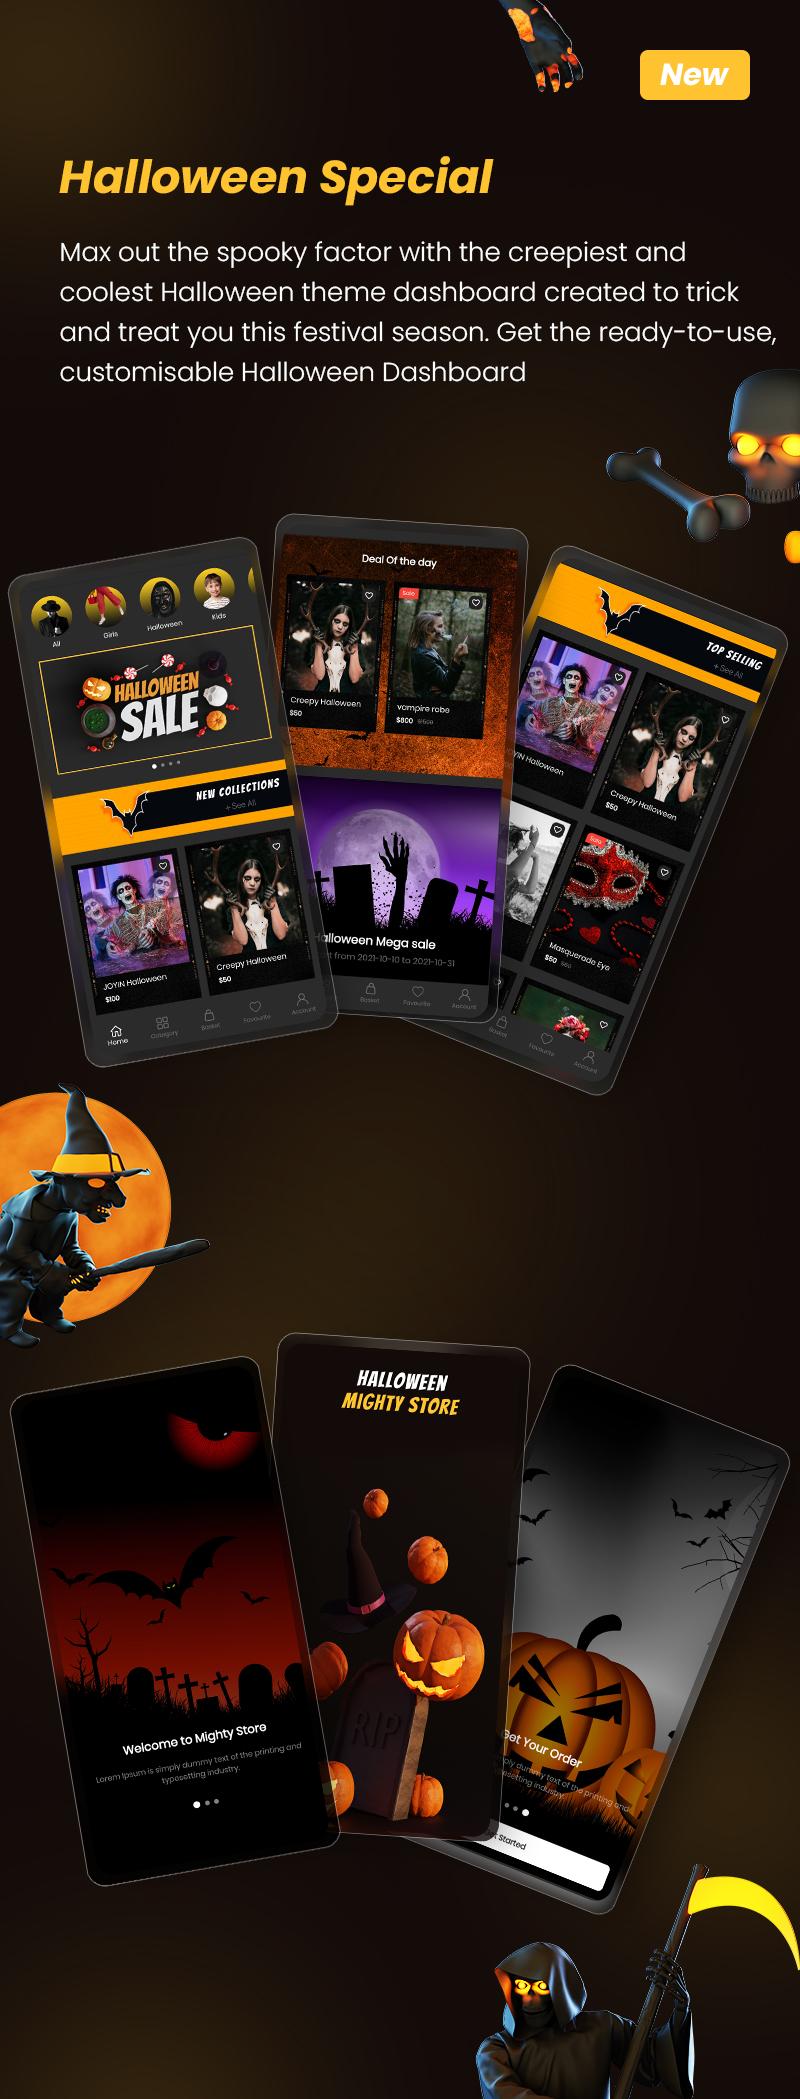 MightyStore E-commerce Flutter Full App: Single + Dokan Multi Vendor + WCMp + Admin App - 4